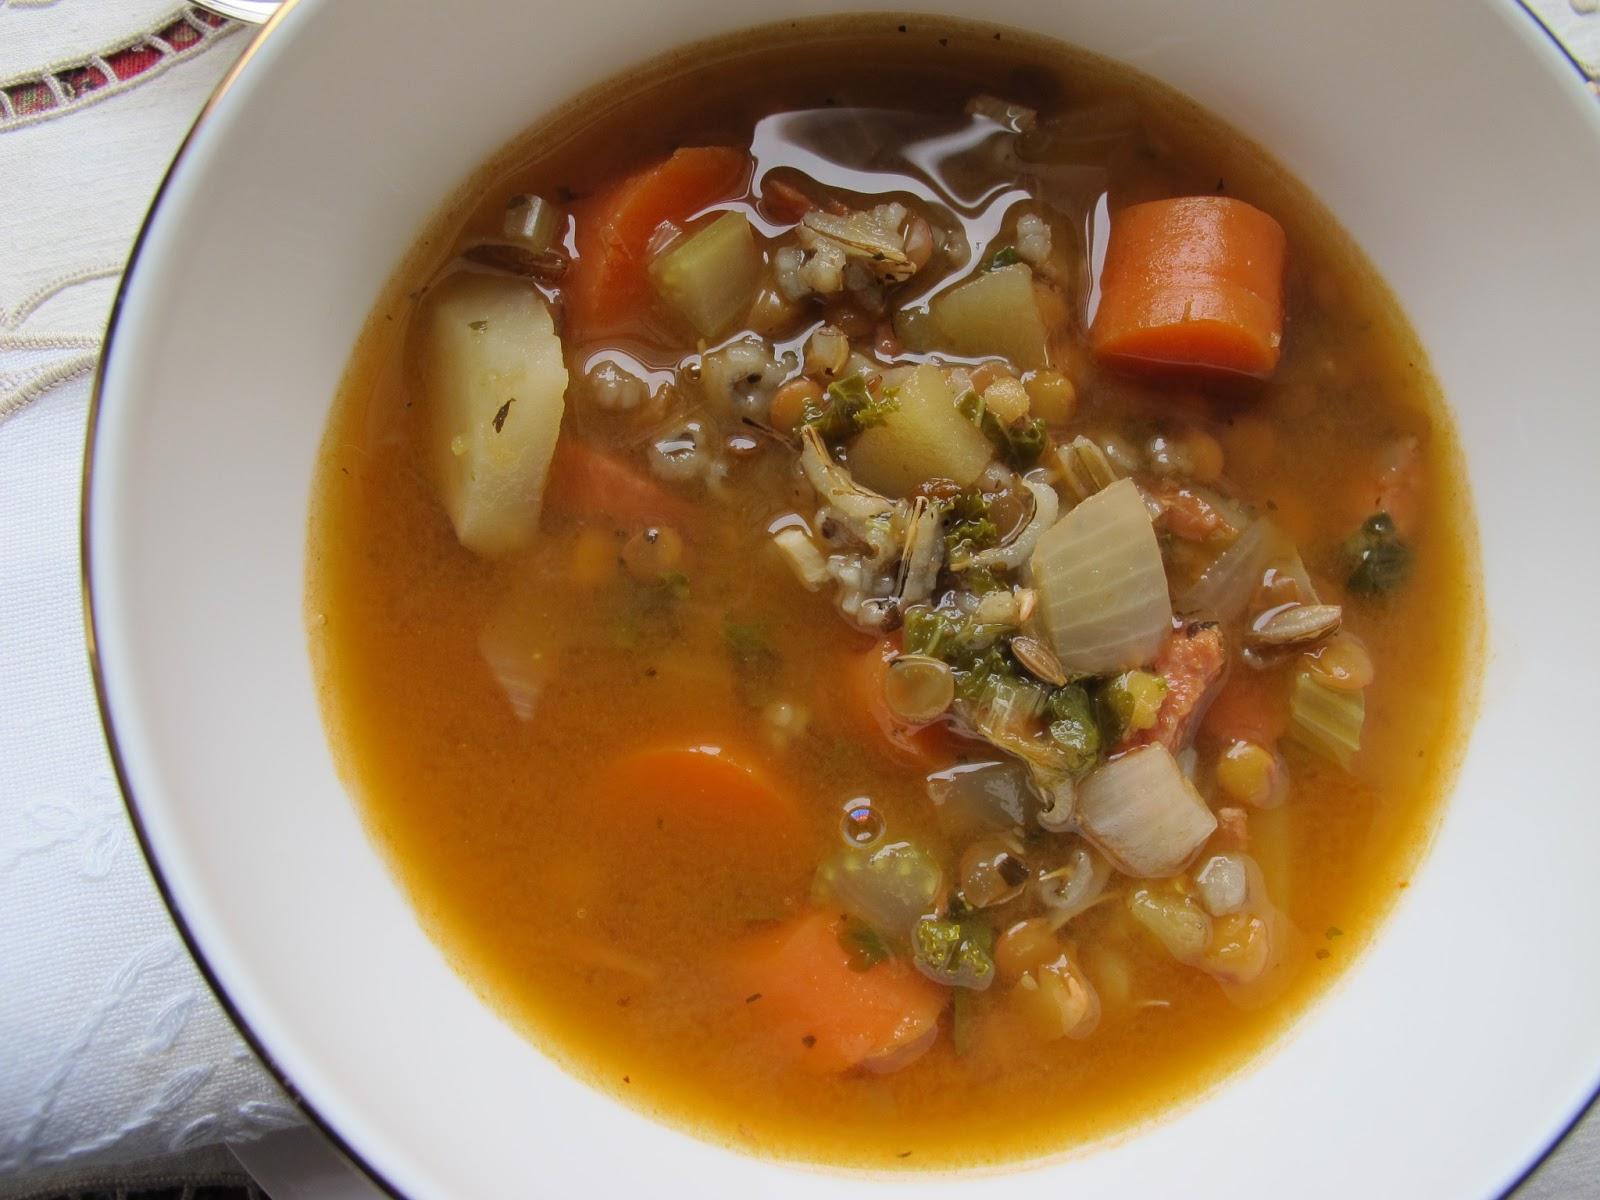 Smitten Kitchen Kale Lentil Sausage Soup